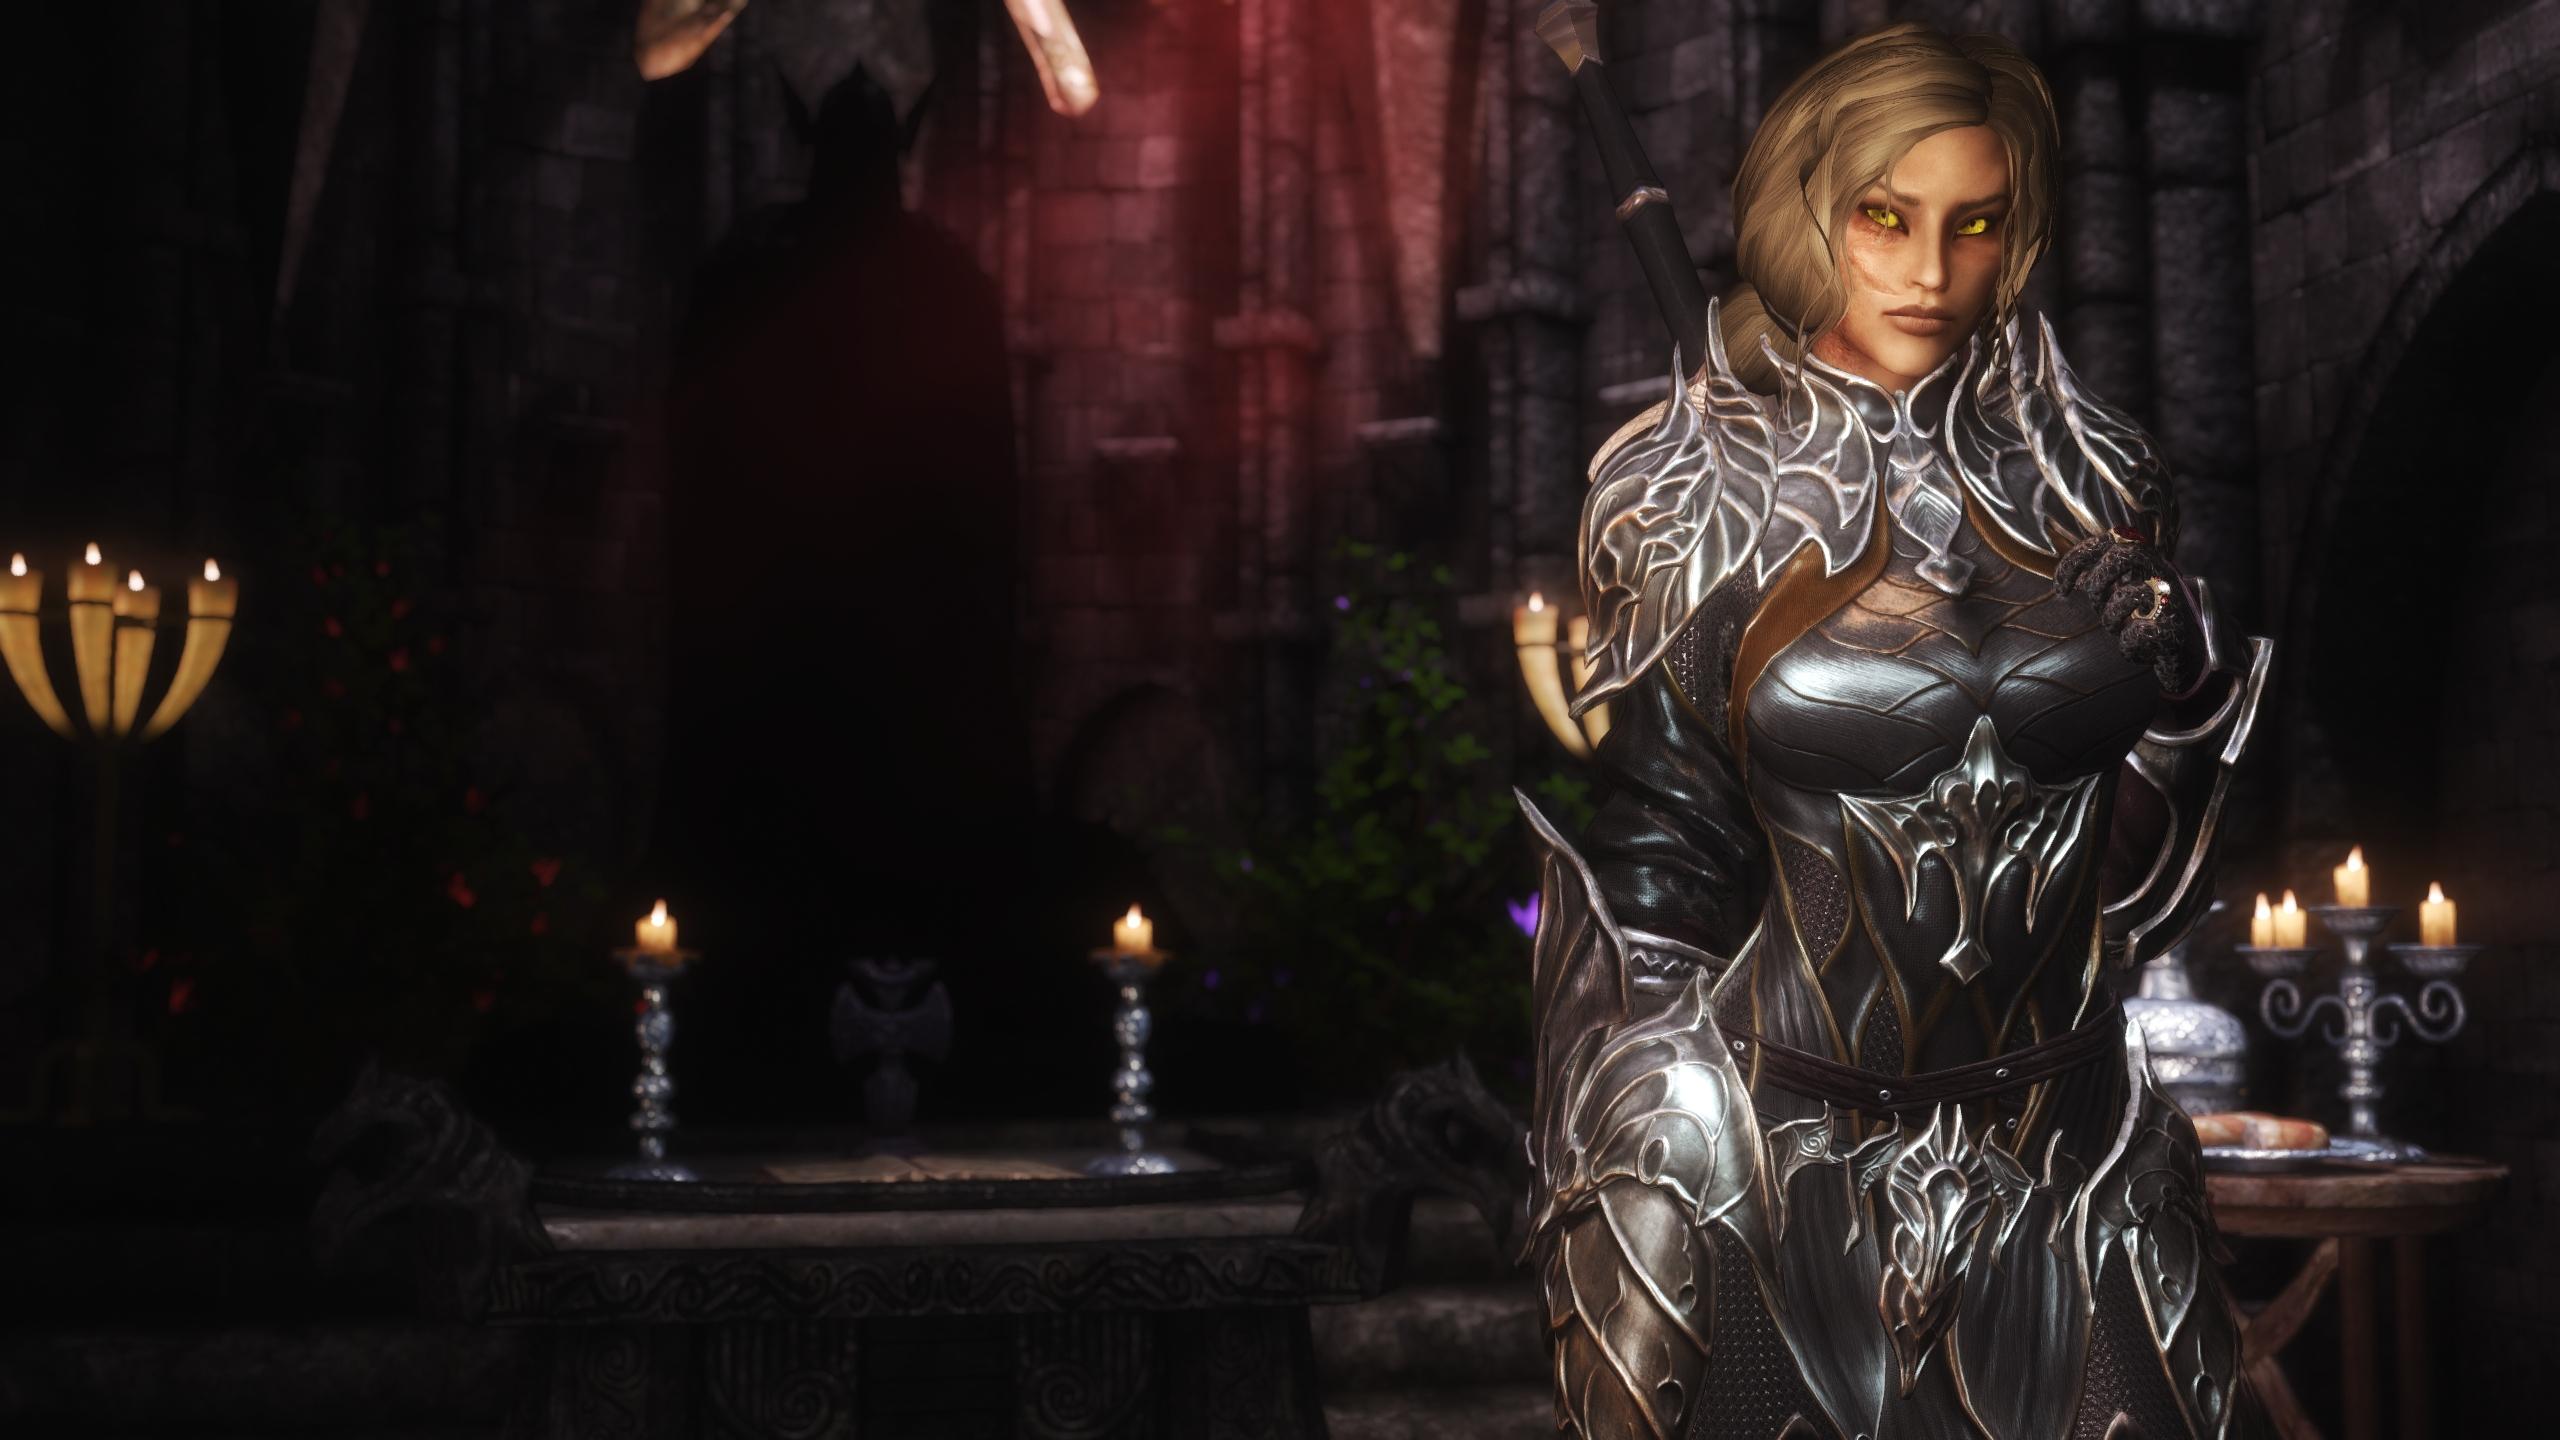 Armor | Tesgeneral